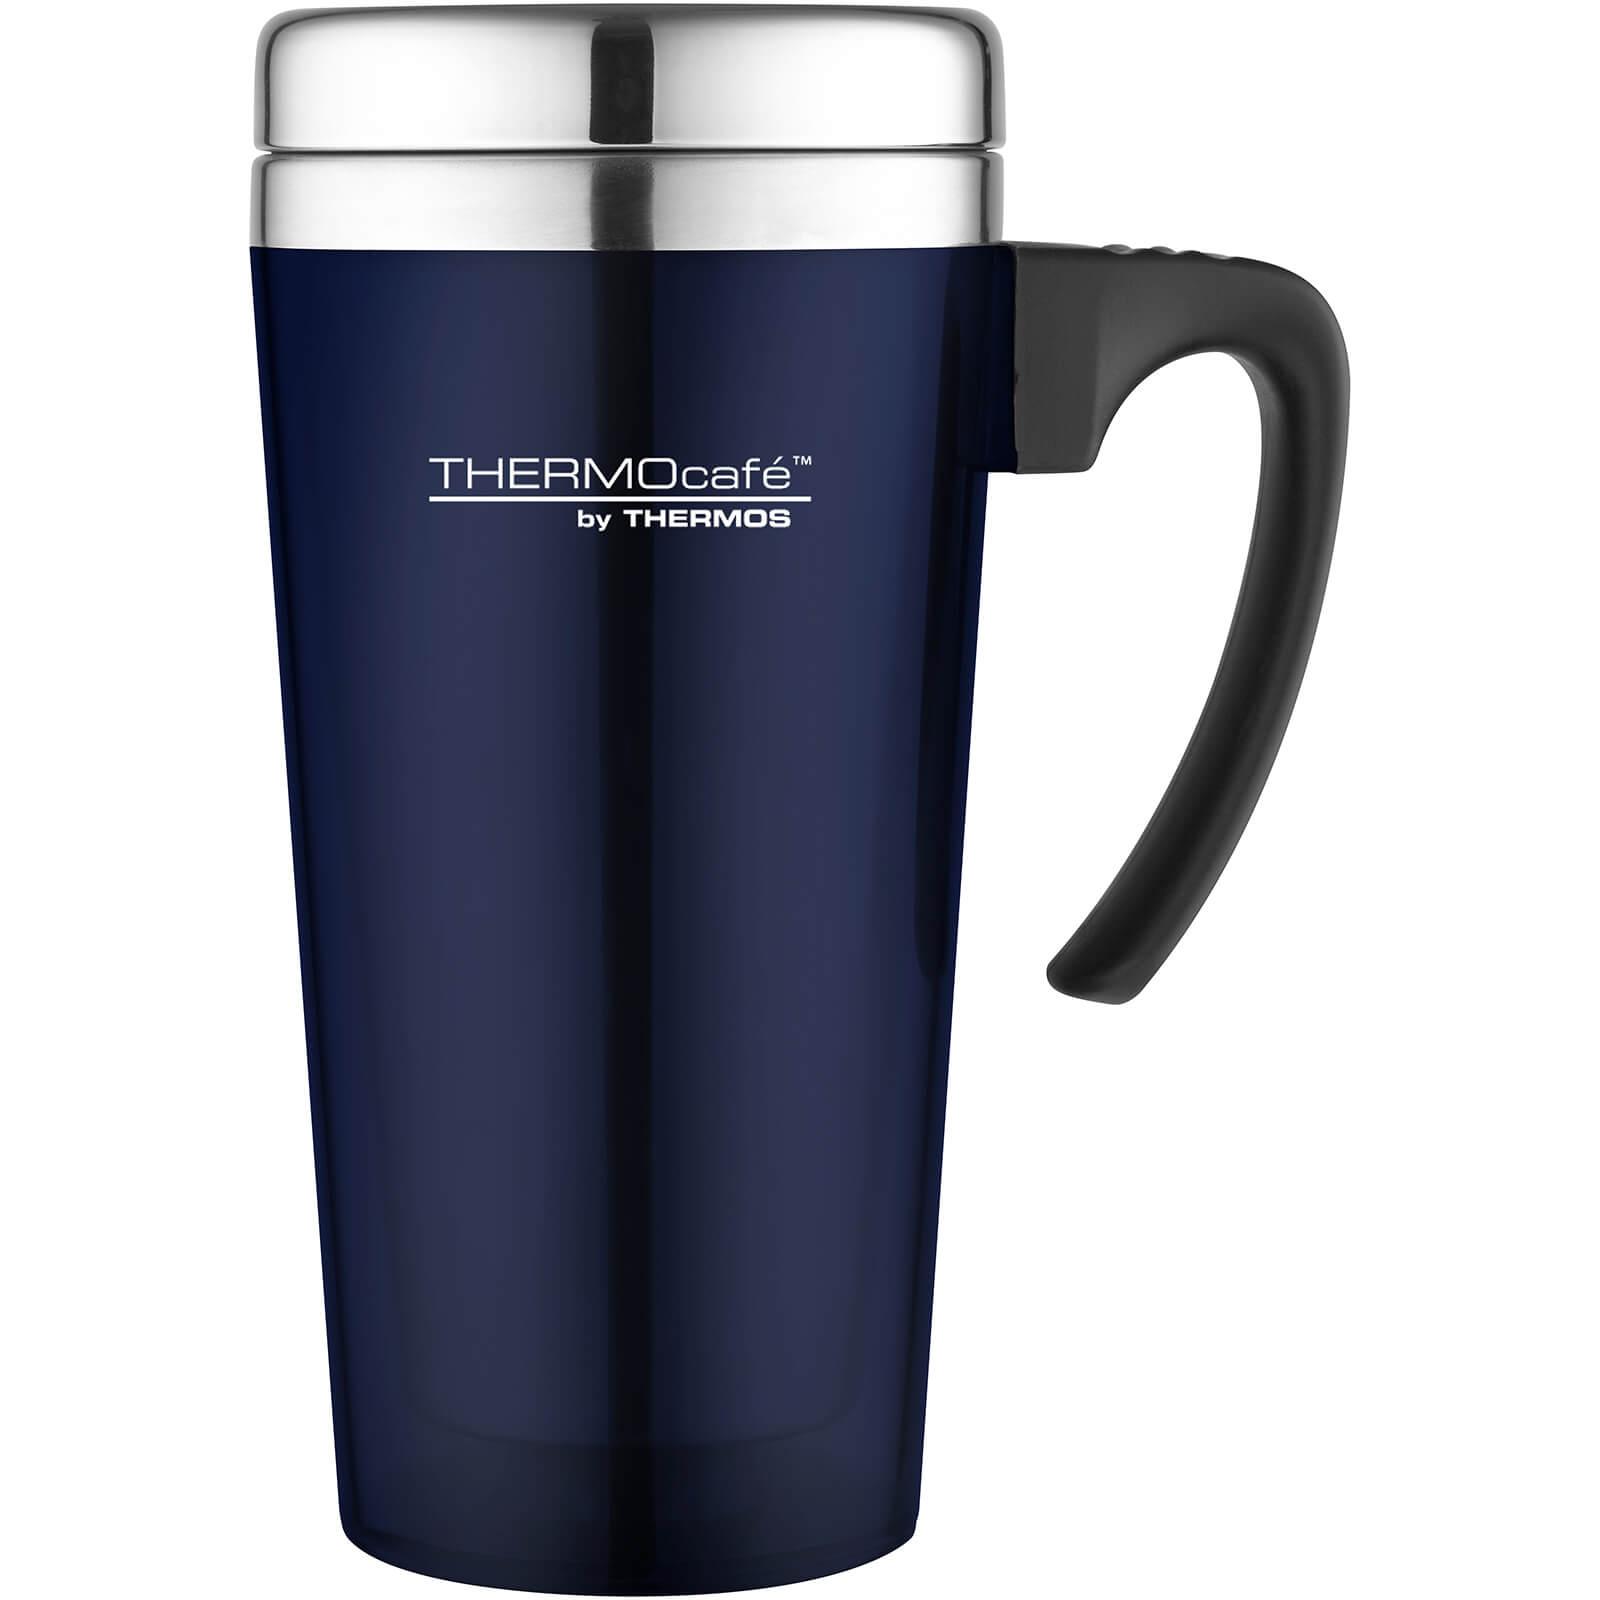 Thermos ThermoCafe Translucent Travel Mug - Blue 420ml